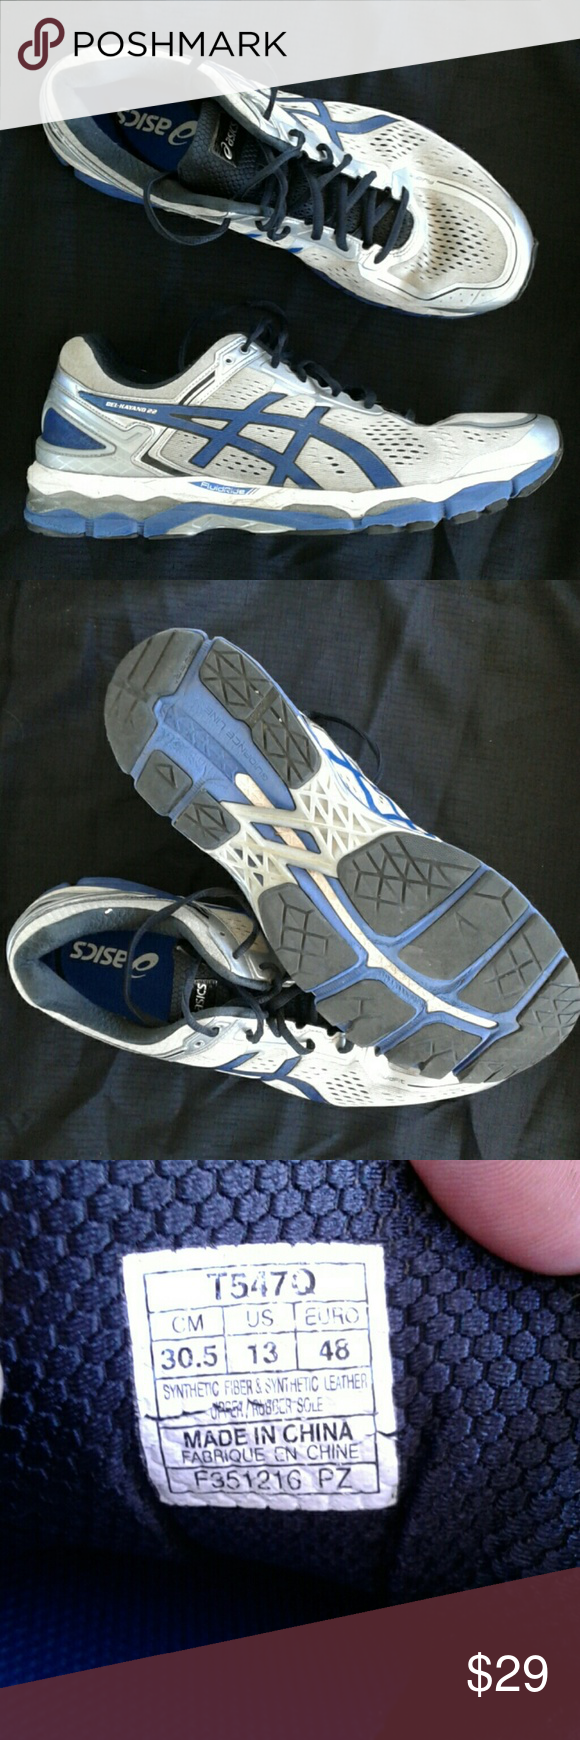 Chaussures de course Asics Kayano Gel Kayano 22 Asics | | bb8204e - pandorajewelrys70offclearance.website